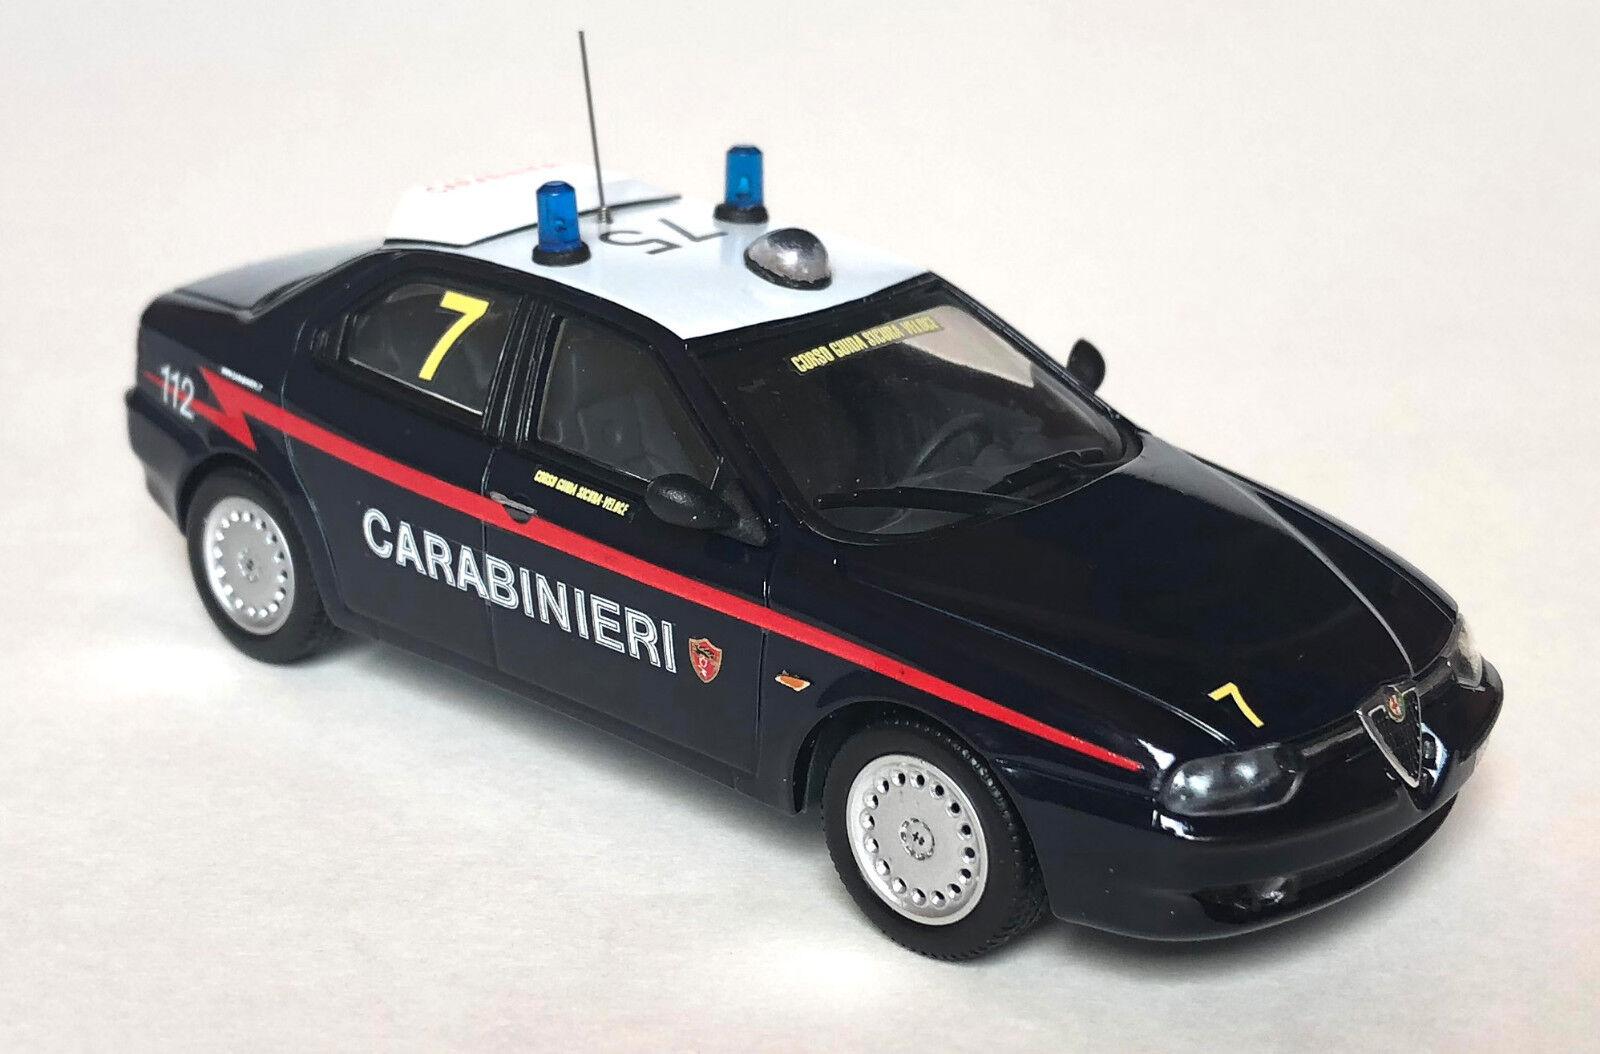 Alfa Romeo 156 Carabinieri NRM NRM NRM Corso Guida Sicura-veloce 1 43  minorista de fitness